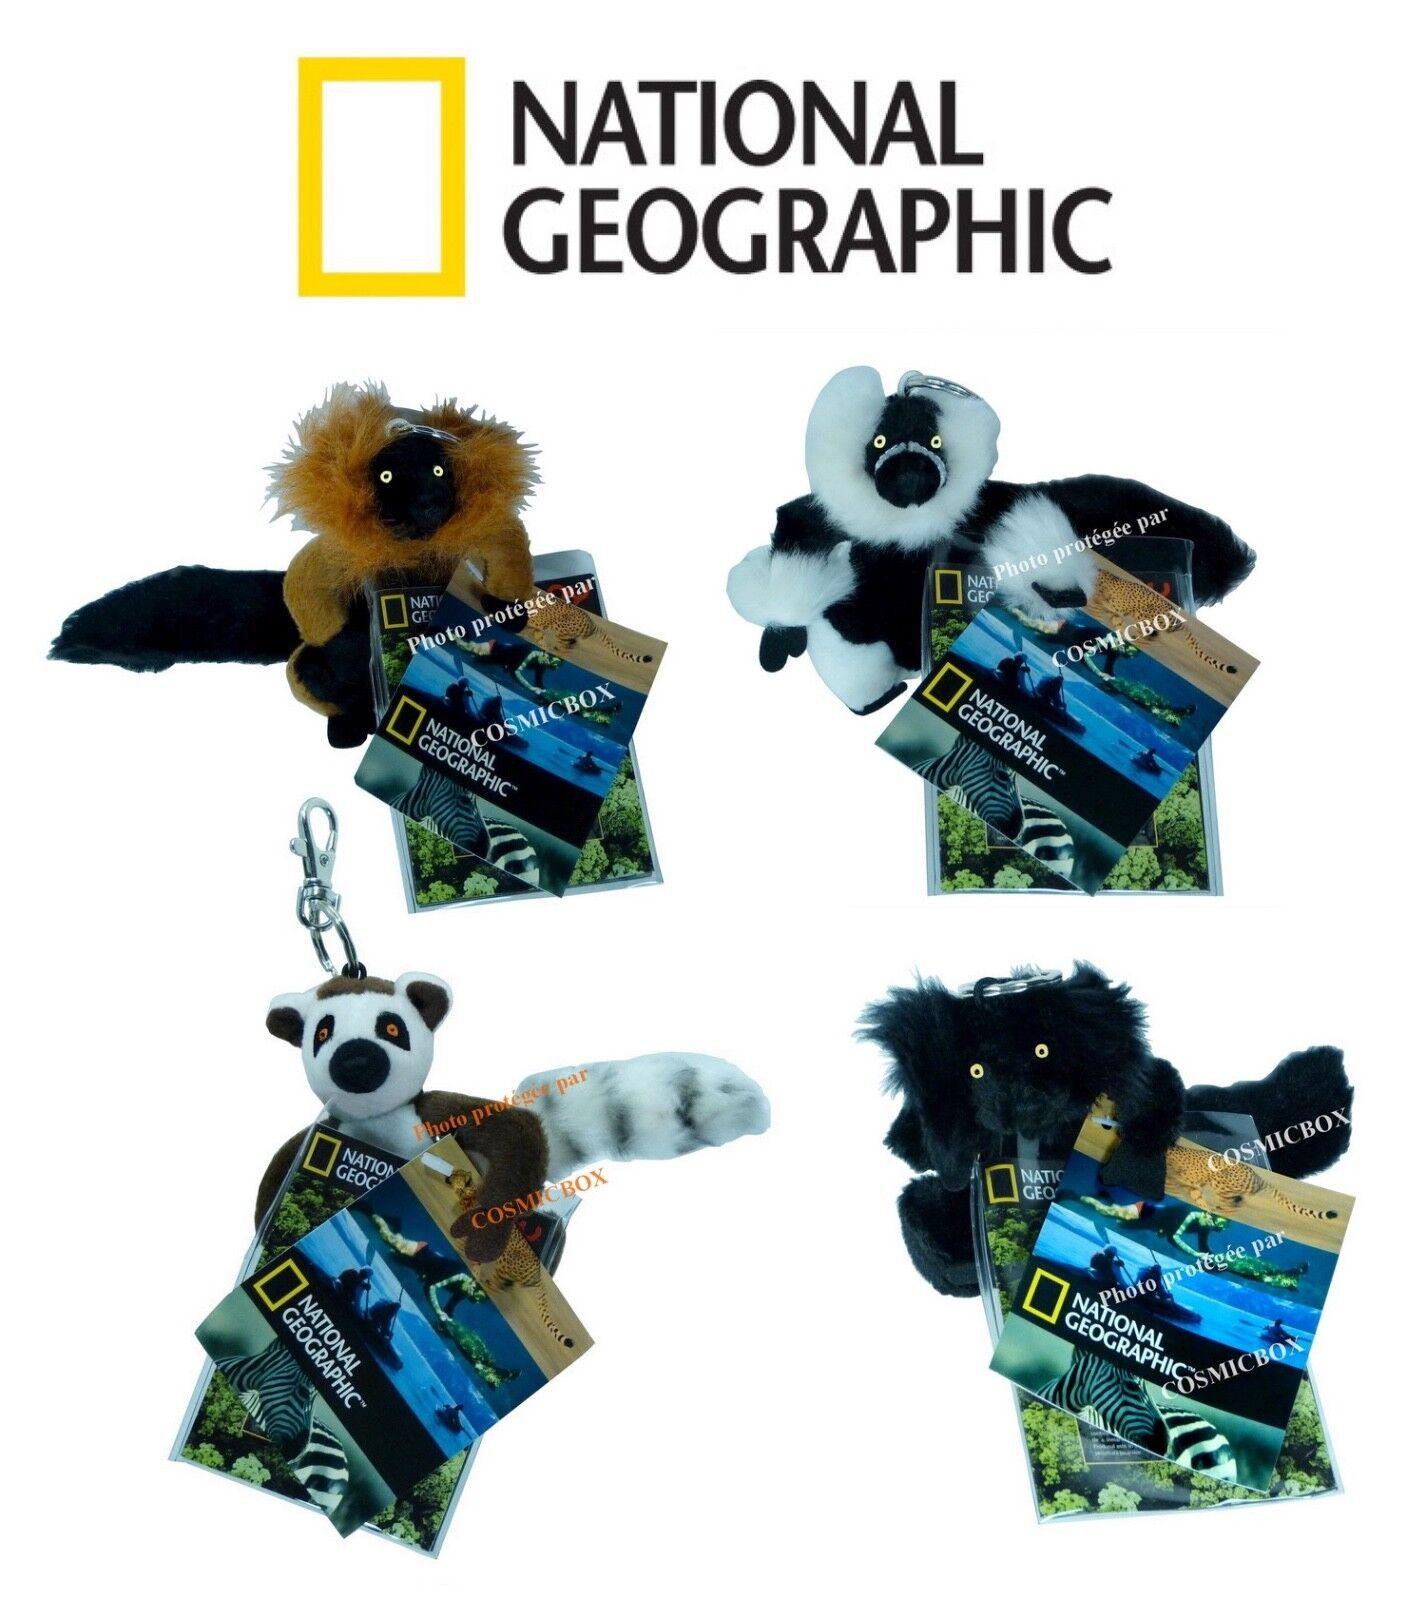 Los 4 porte cl  s national geographic peluches l  muriens animaux sauvages lemuren